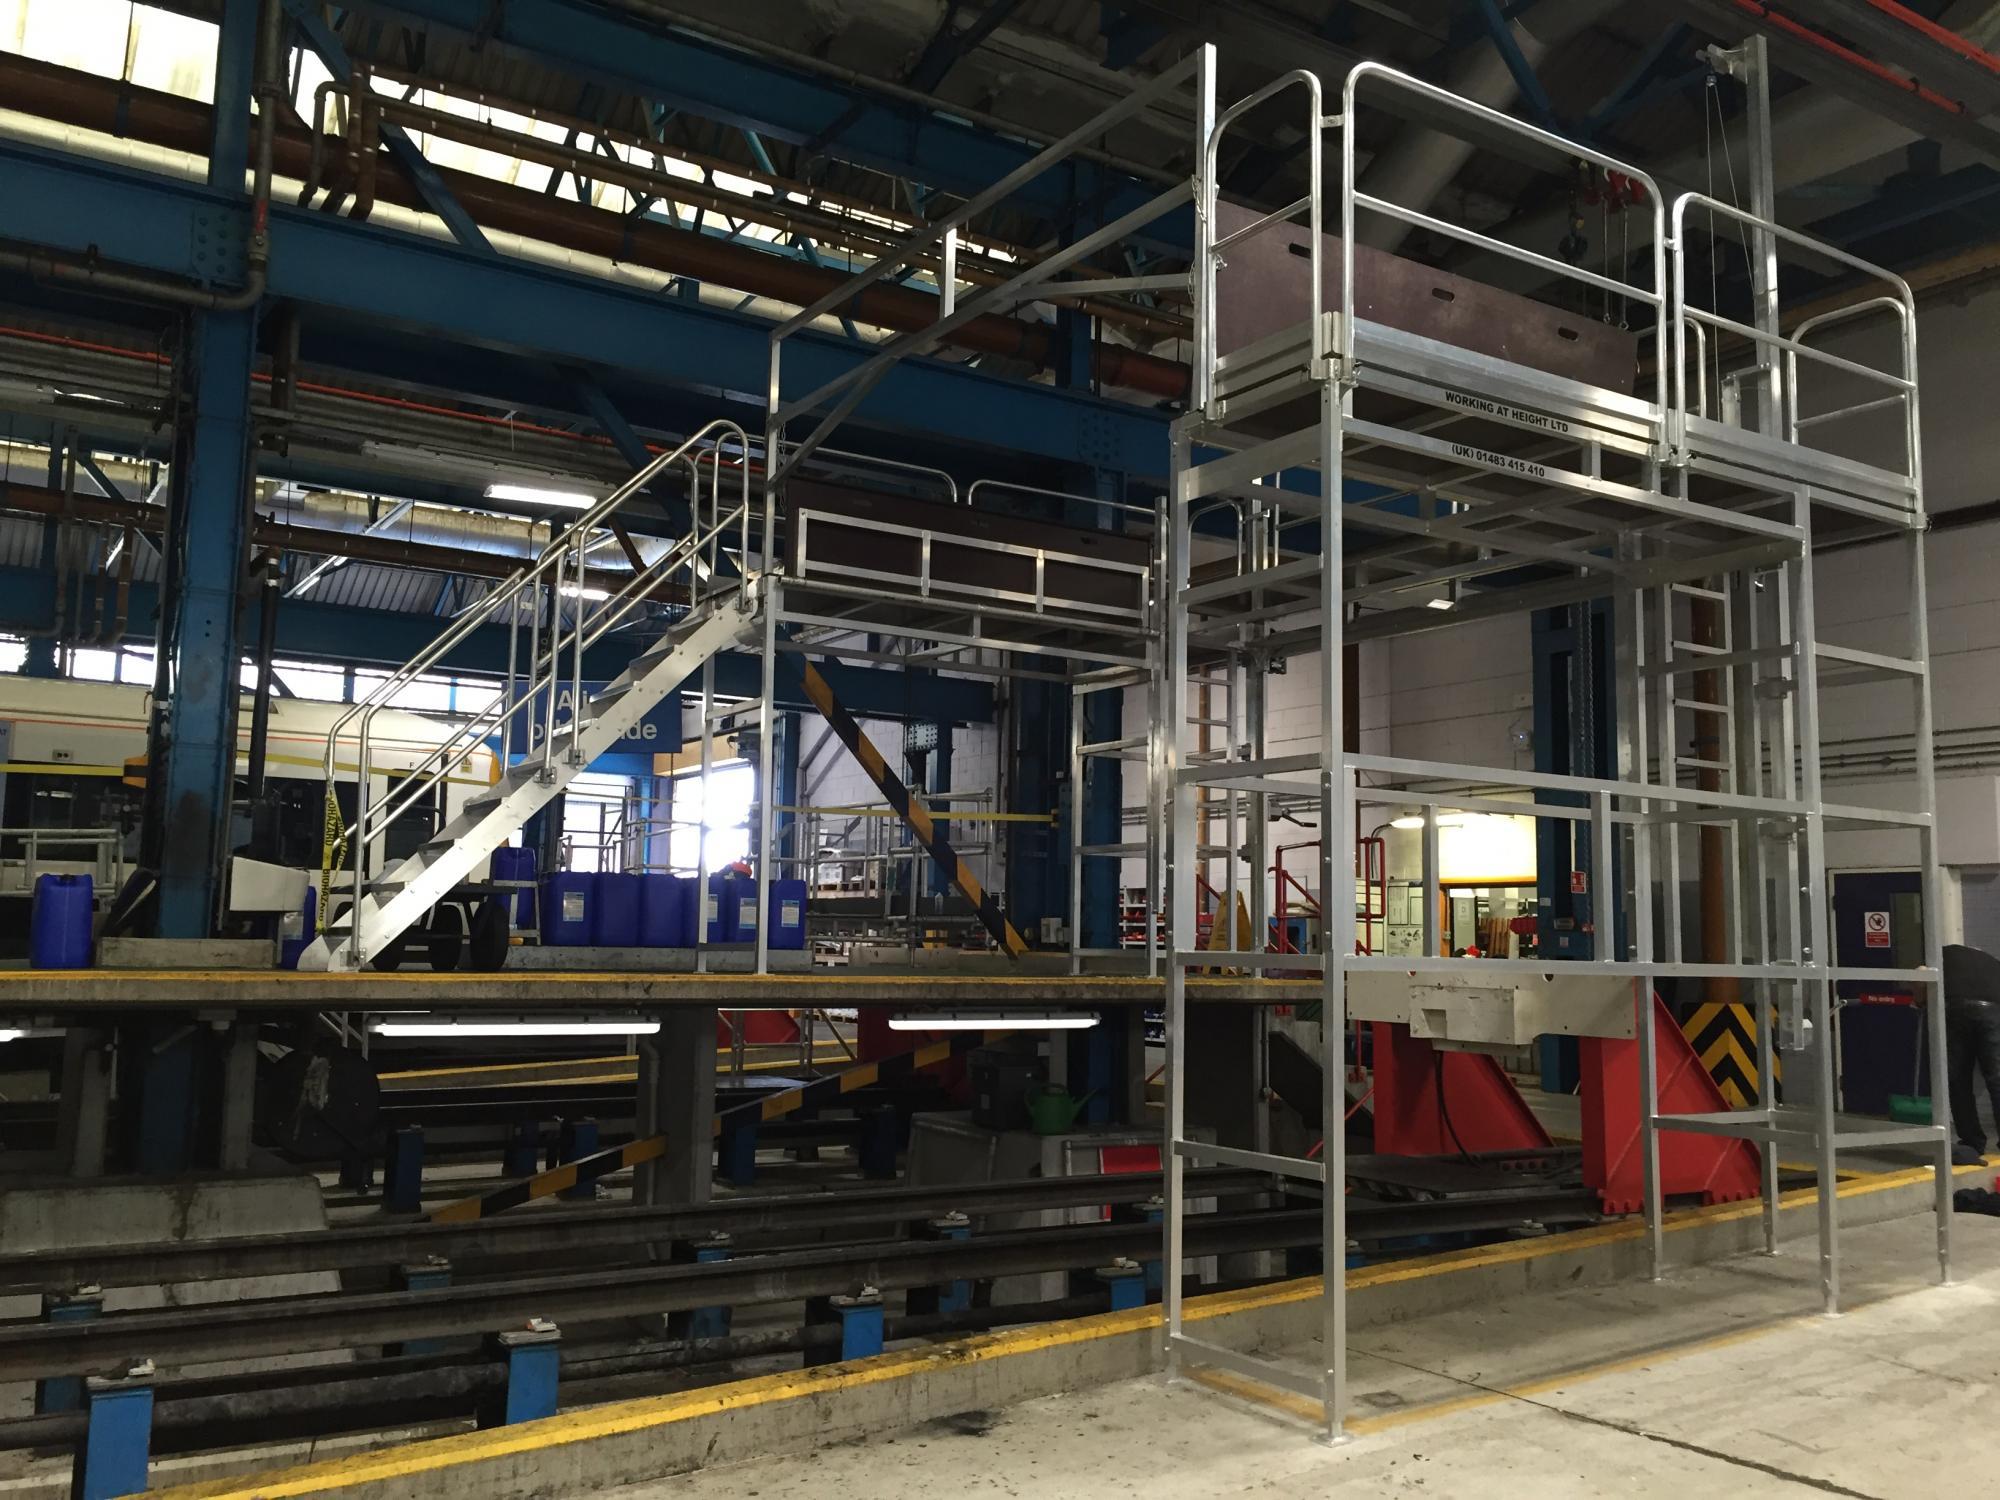 Traincare Depot Acesss Platform Working At Height